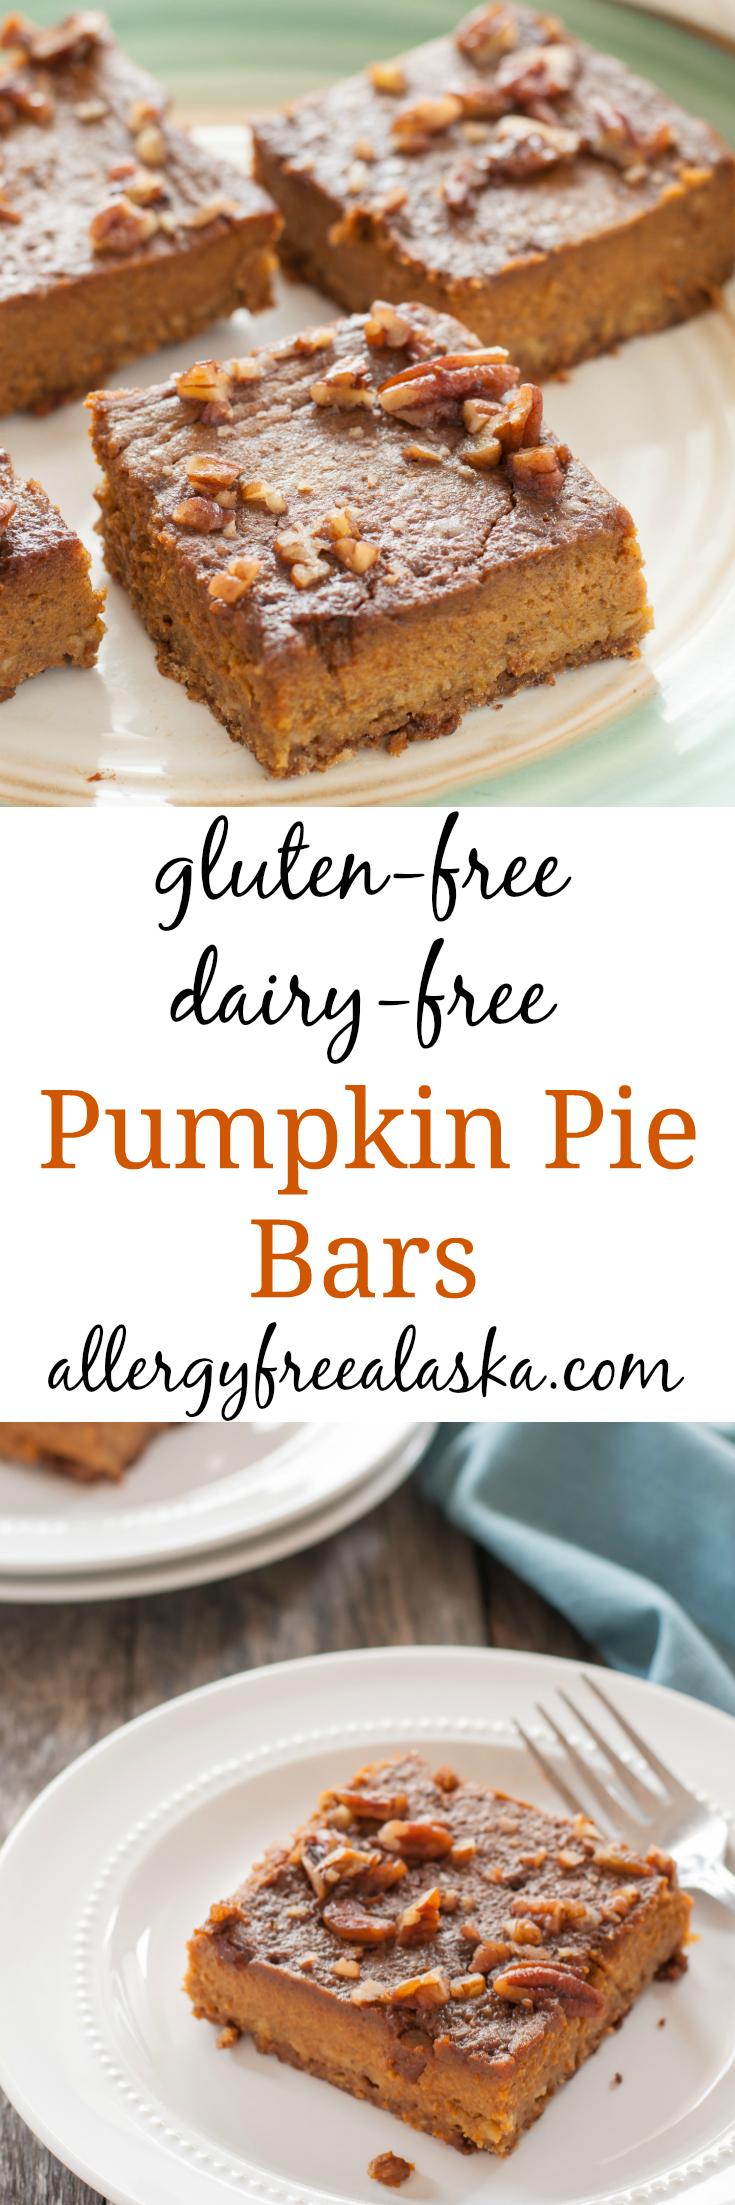 gluten-free-dairy-free-pumpkin-pie-bar-recipe-from-allergy-free-alaska